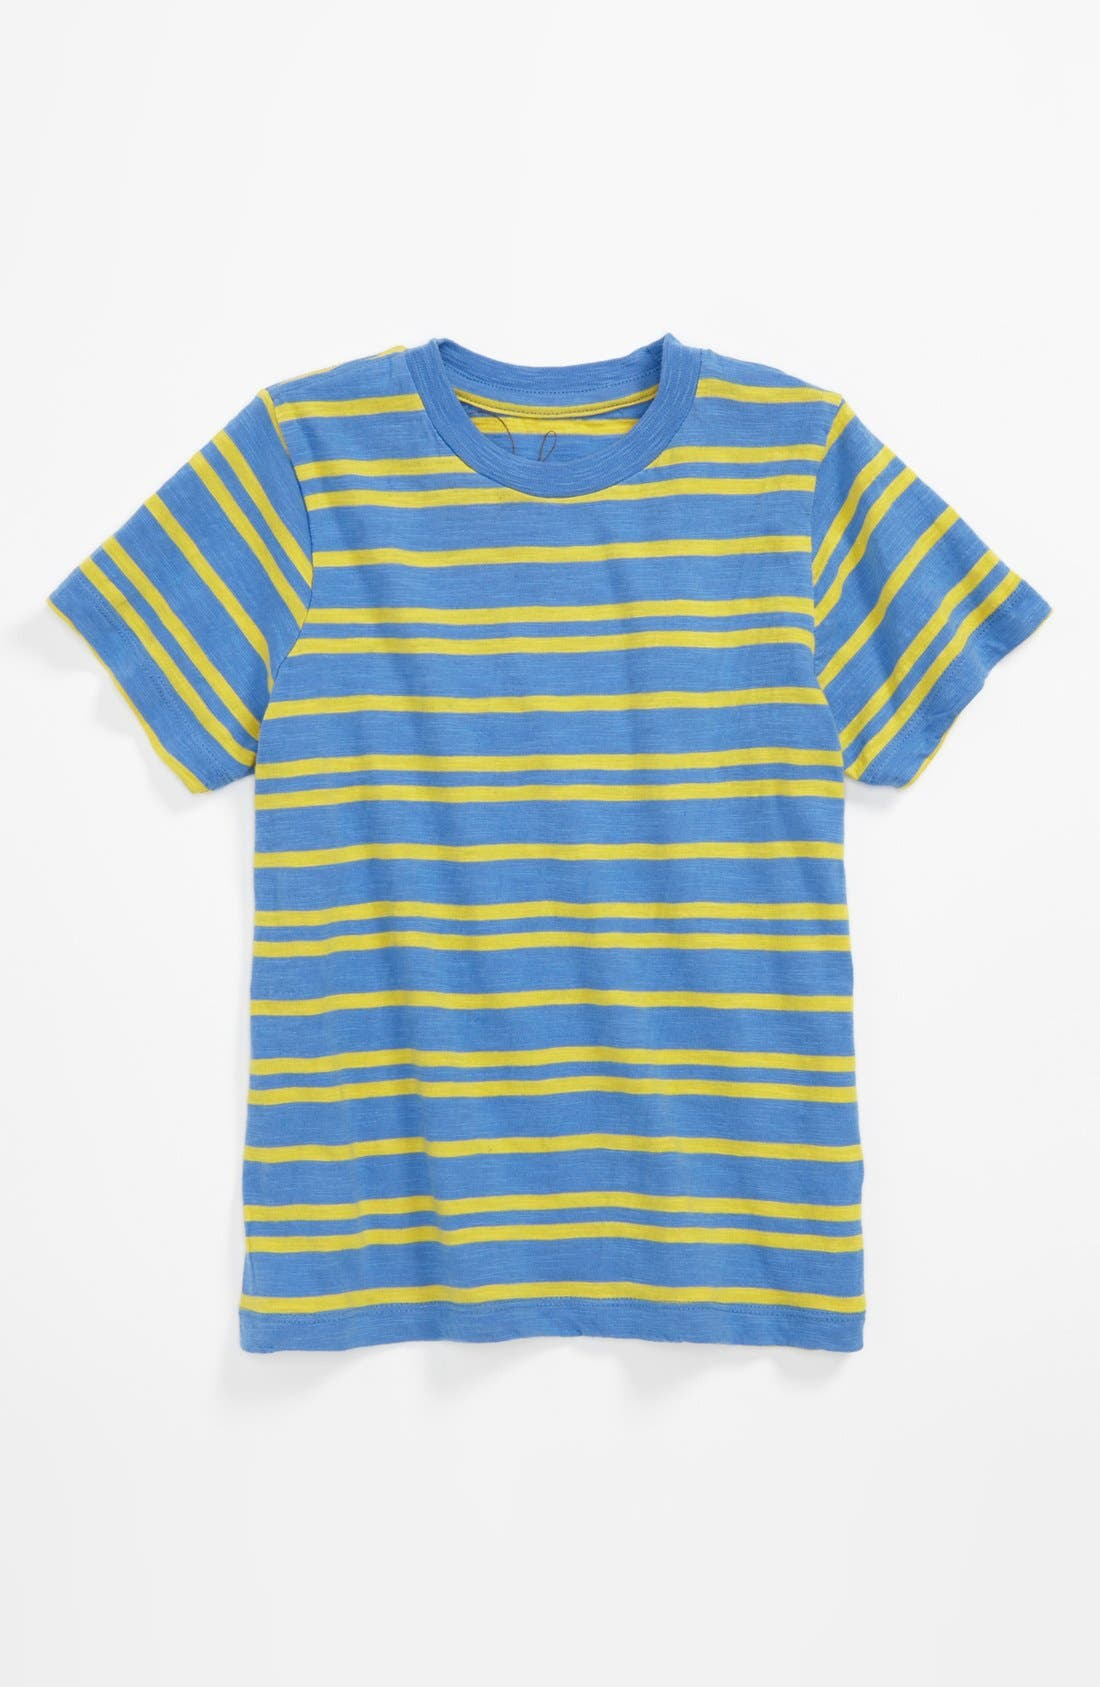 Alternate Image 1 Selected - Peek 'Harrison' T-Shirt (Big Boys)